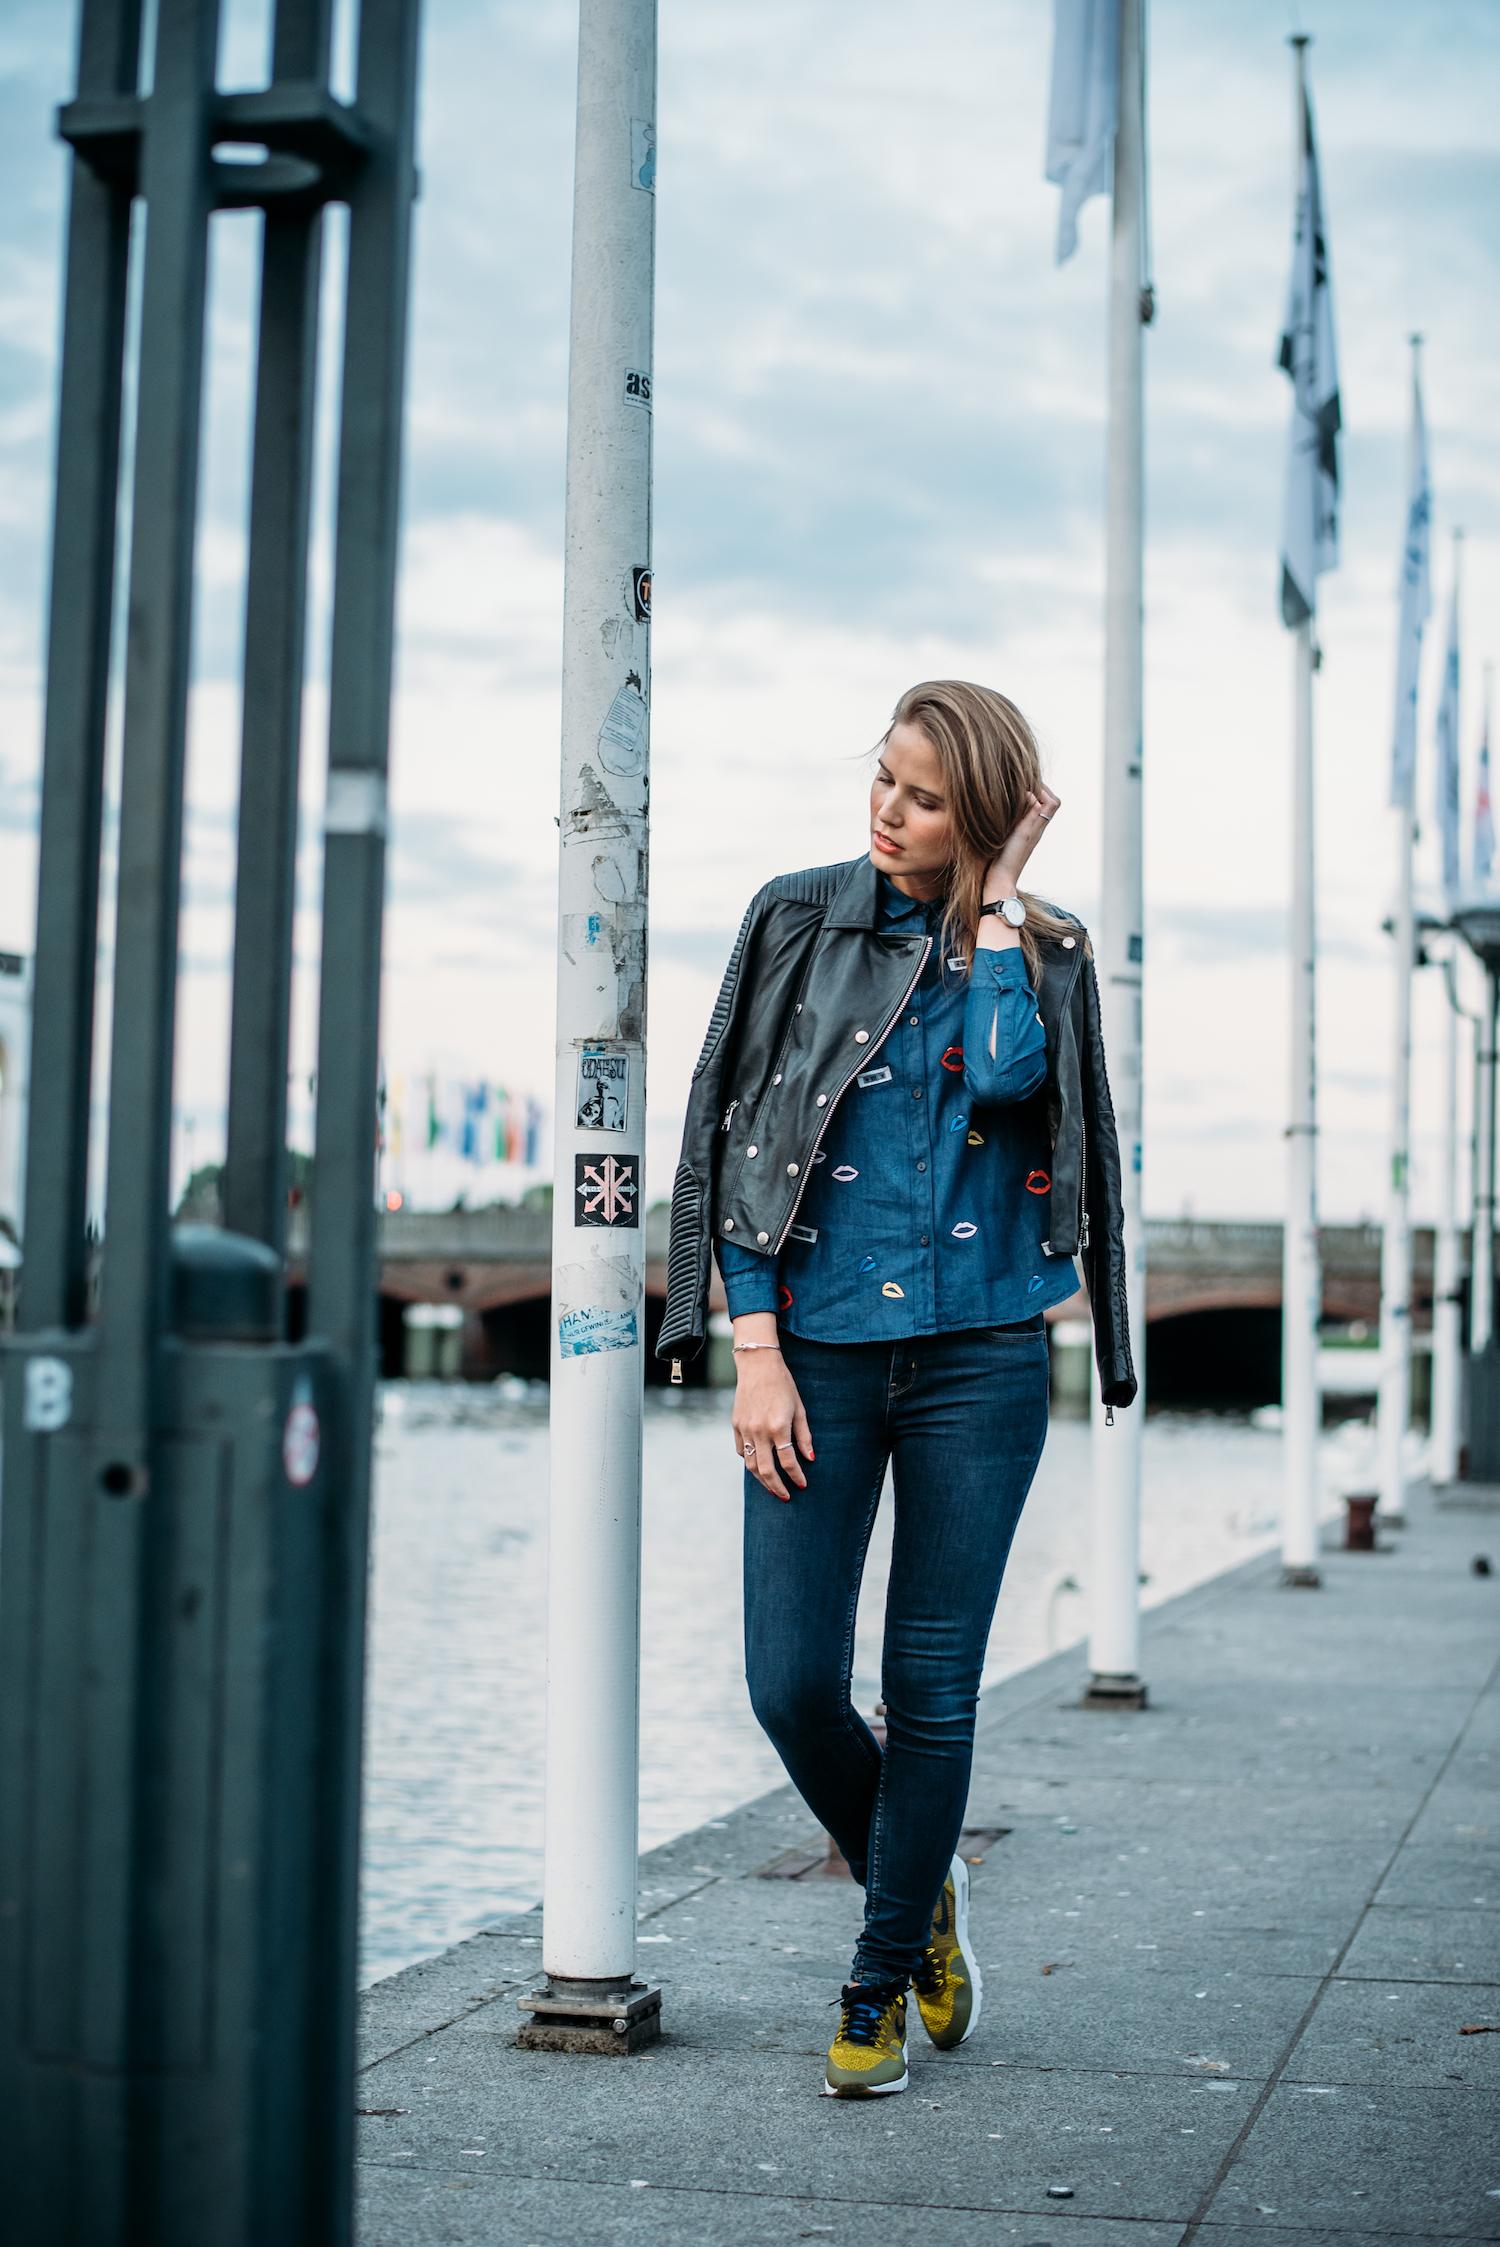 suelovesnyc_susan_fengler_blog_sue_loves_nyc_outfit_lederjacke_jeanshemd_mut_4